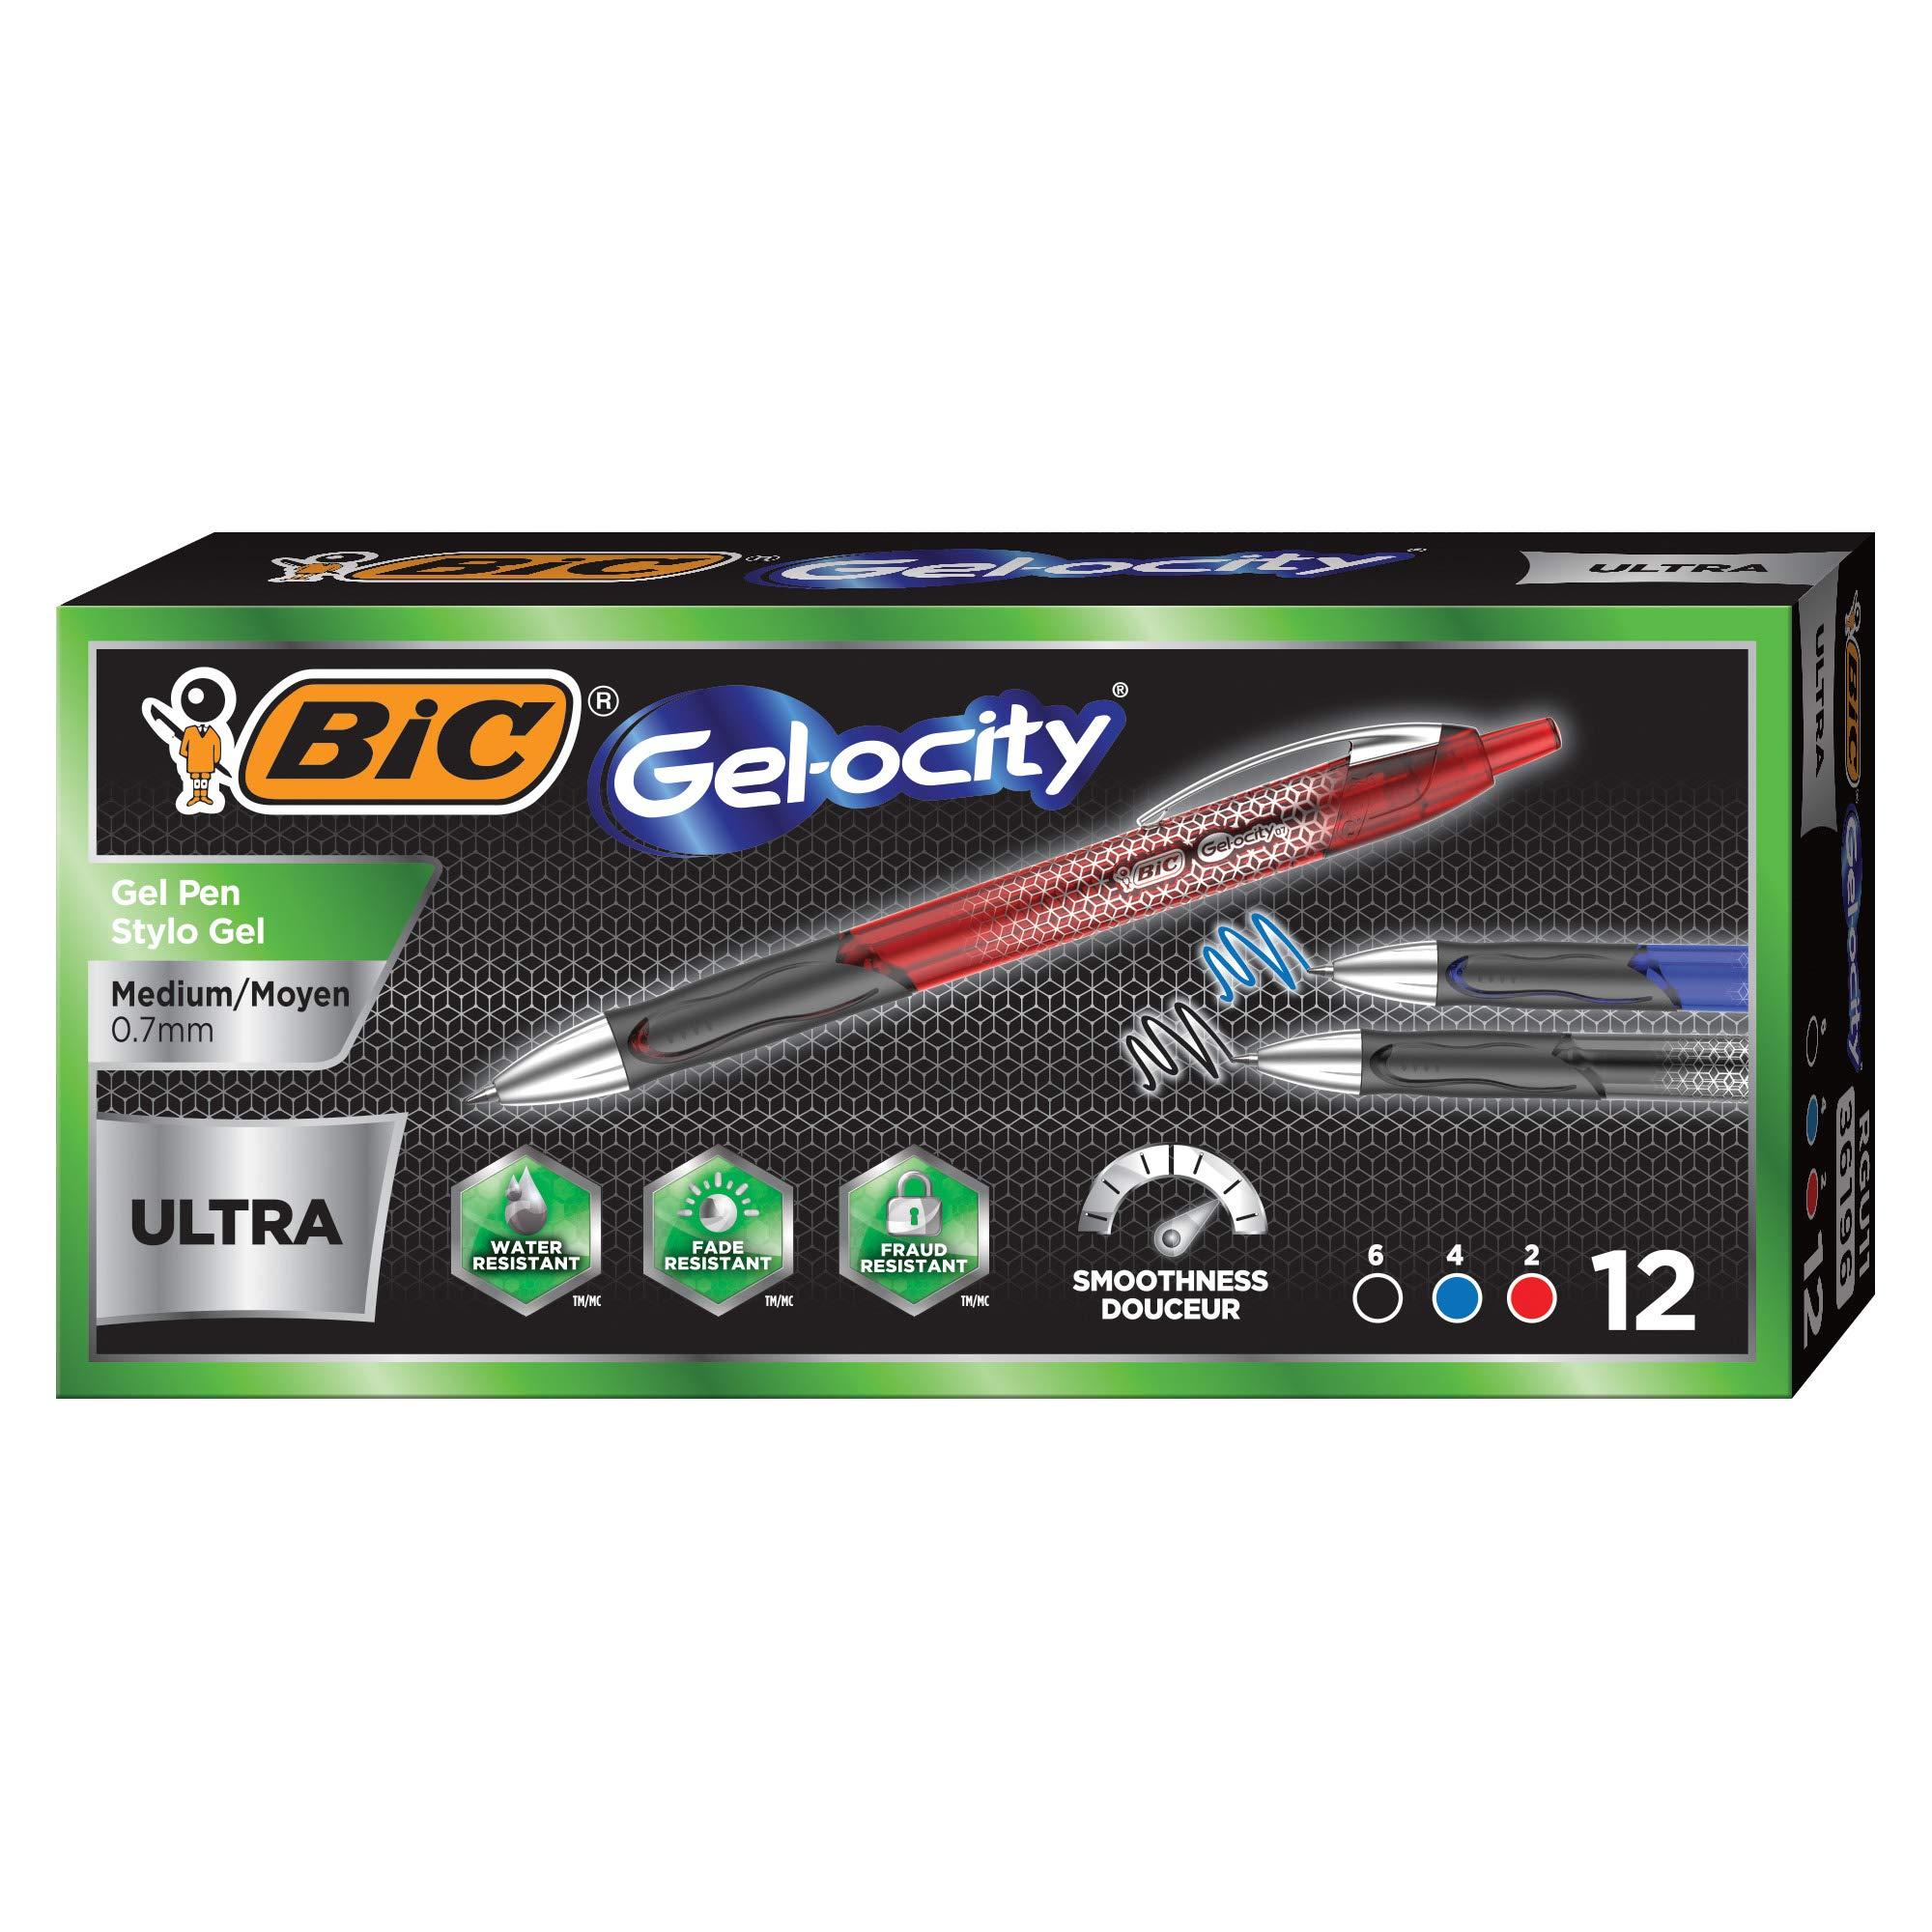 BIC Gel-ocity Ultra Retractable Gel Pen, Assorted Colors, 12-Count by BIC